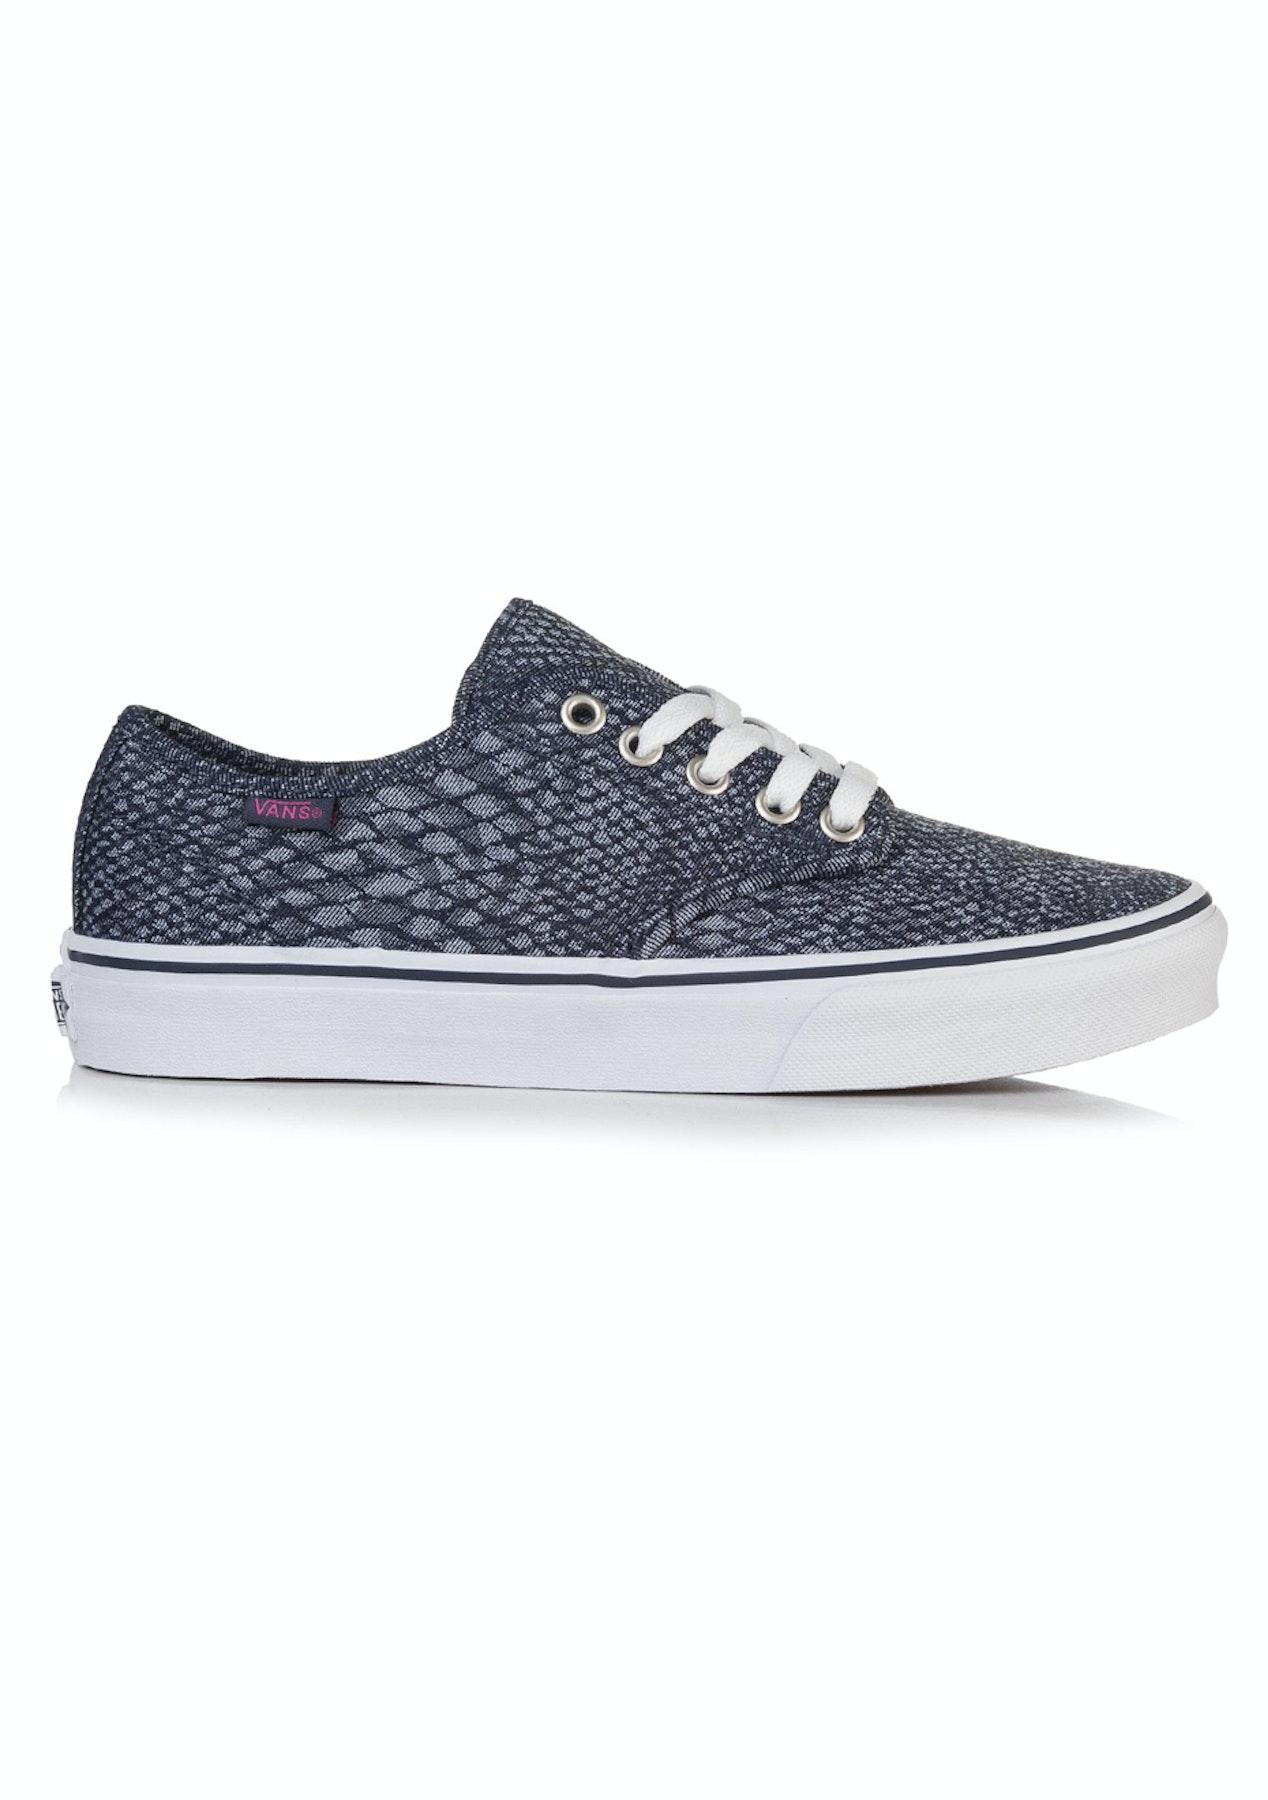 8b5841e6a0b Vans - Womens Camden Stripe Snake - Jacquard Navy - Free Shipping Street  Shoes + Slides - Onceit